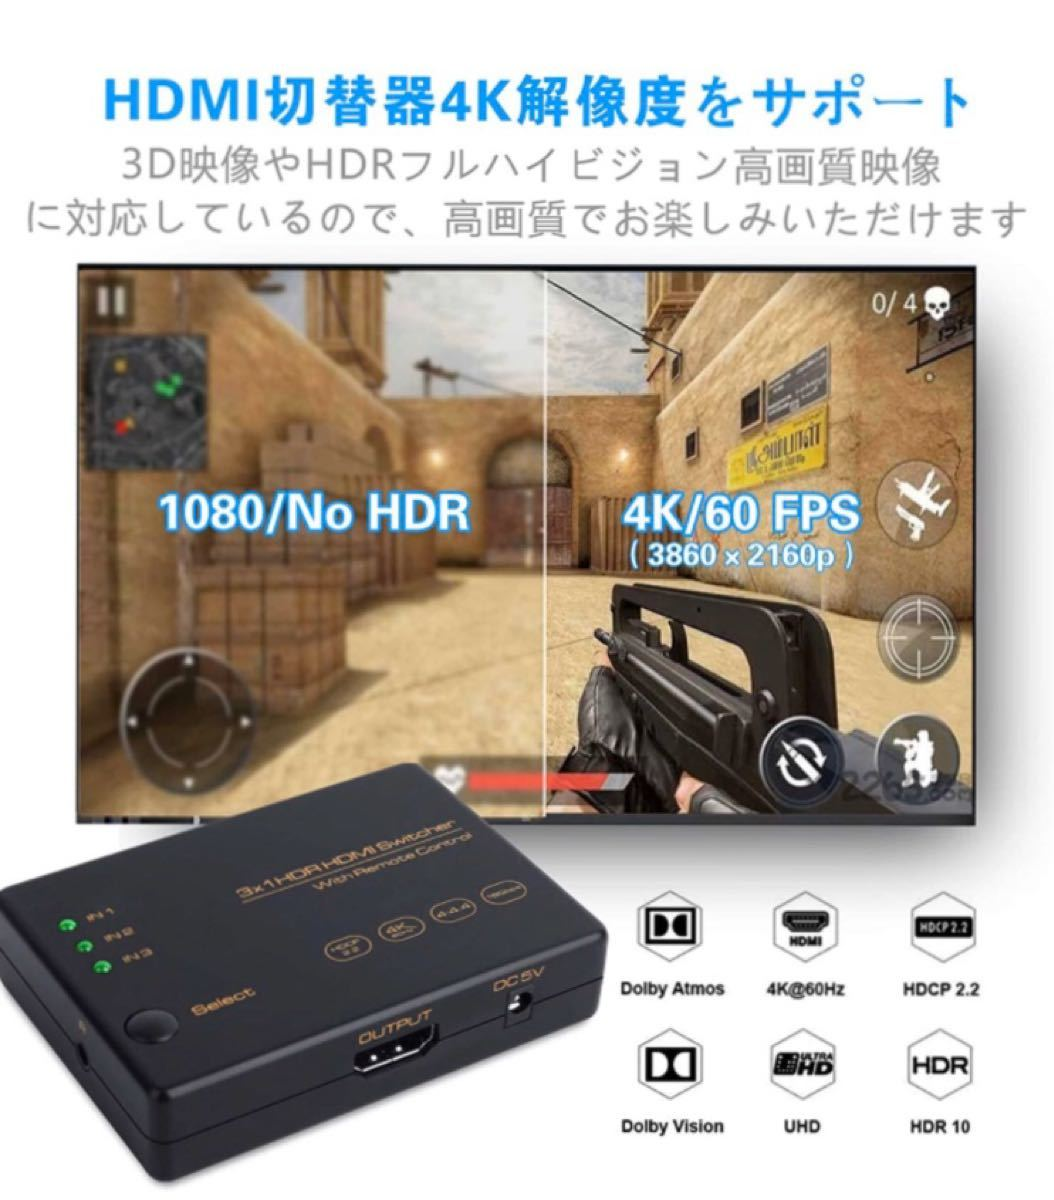 HDMI切替器 3入力1出力 HDMI2.0 HDMI セレクター 4K60Hz HDMI分配器 usb給電 HDCP2.2対応